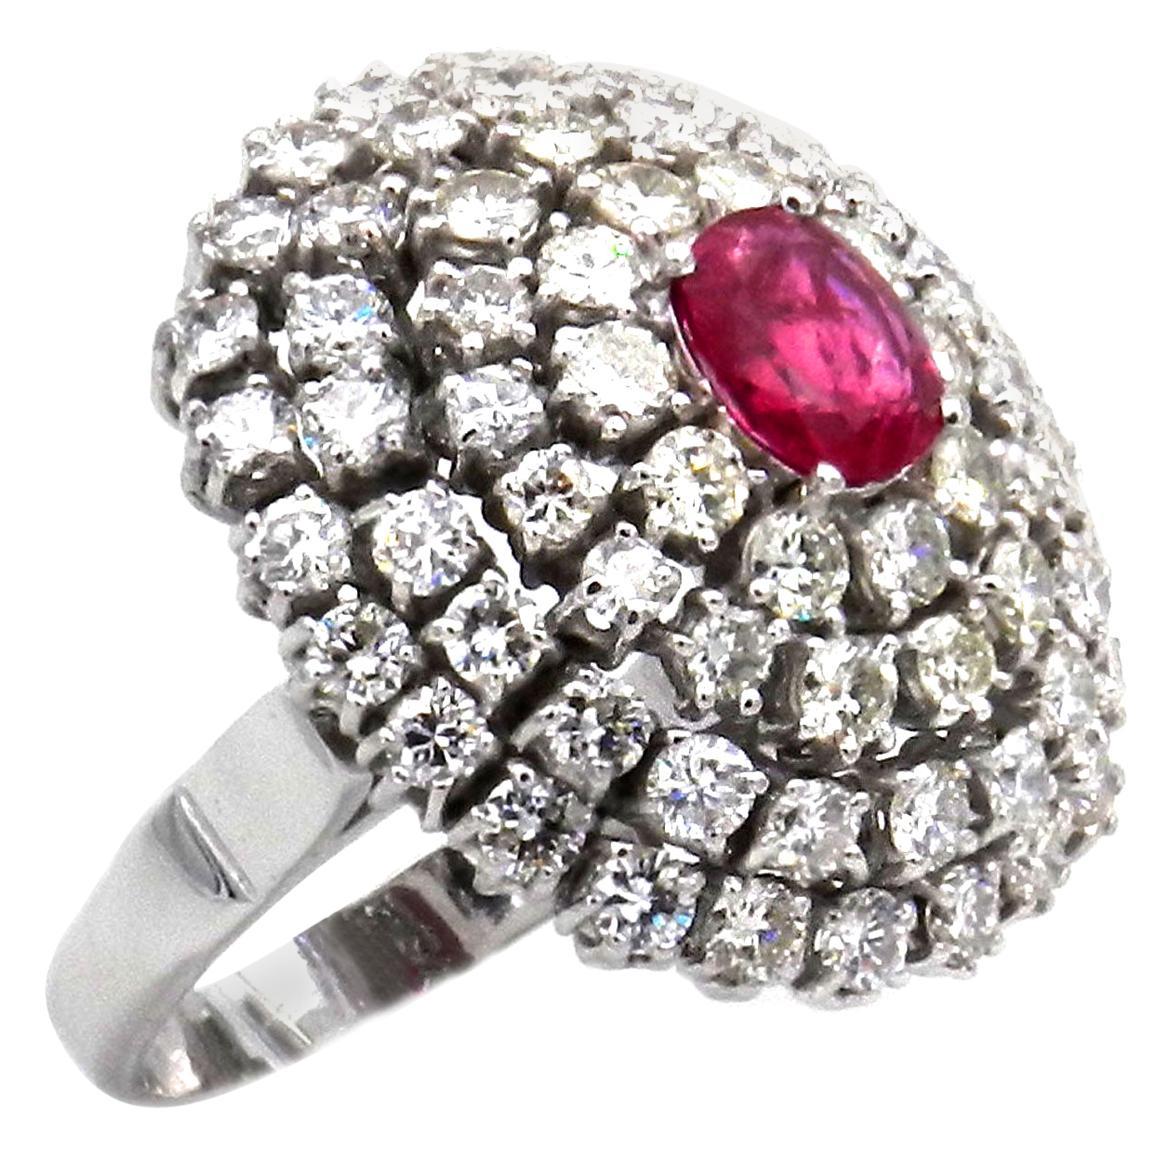 Natural Ruby and 4 Carat Diamond Cocktail Ring in 18 Karat White Gold